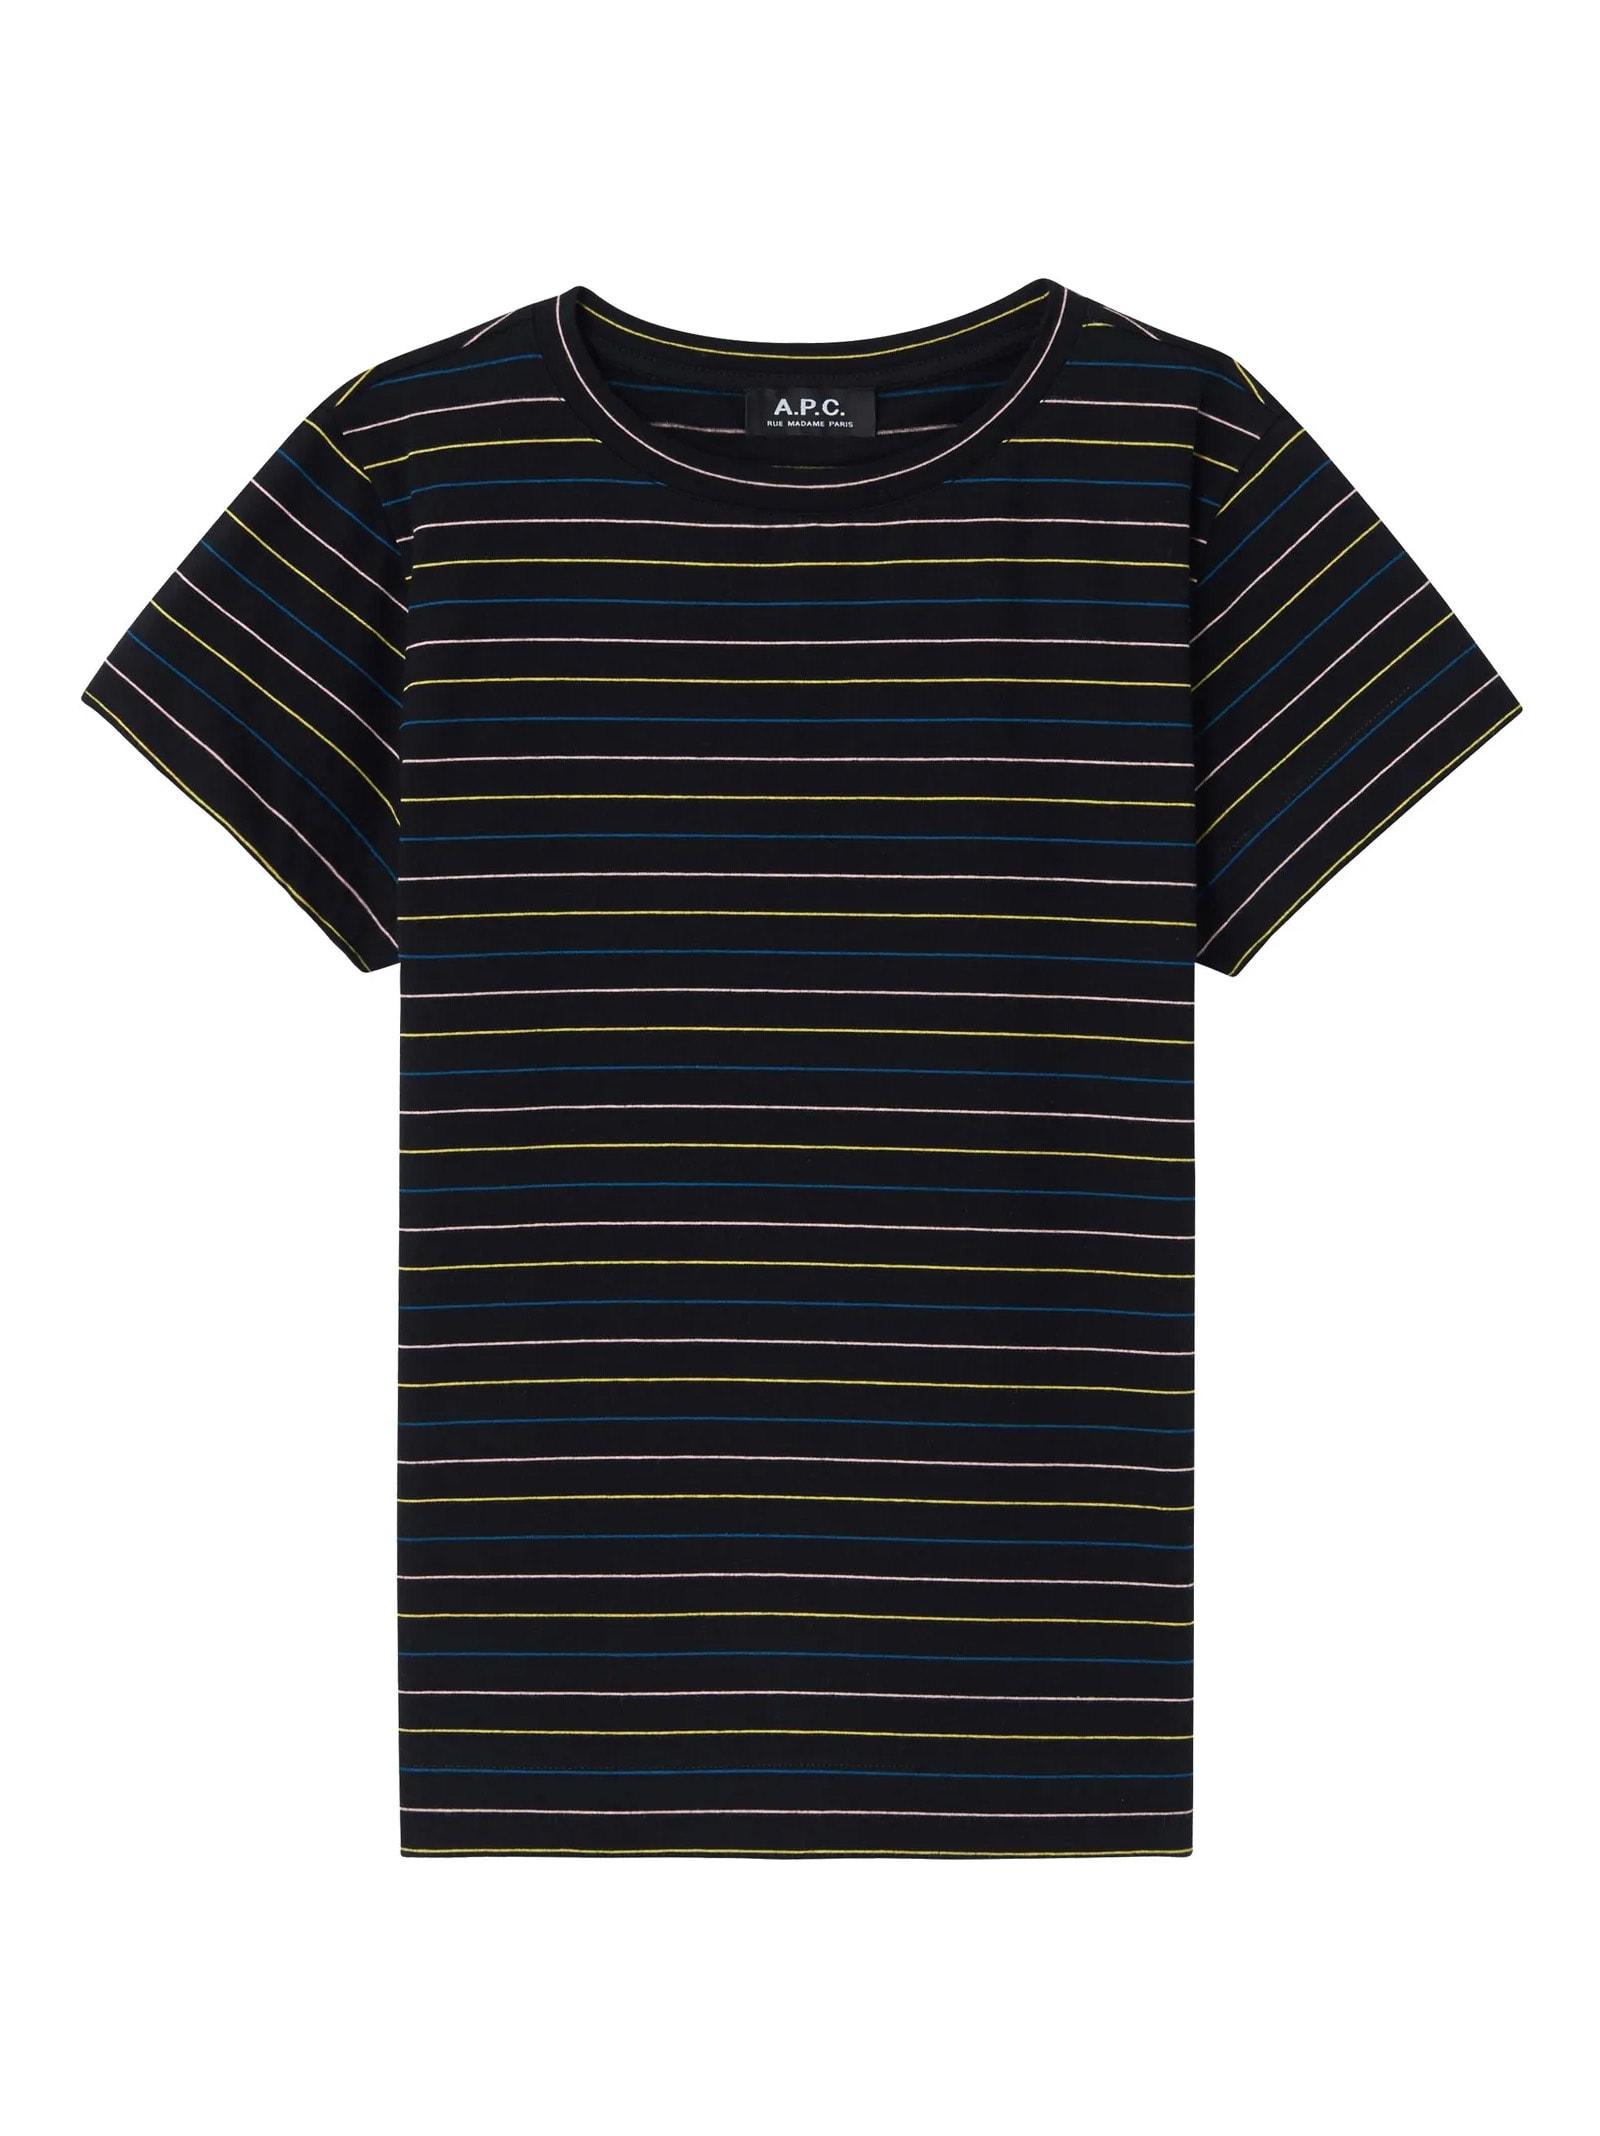 A.P.C. T Shirt Thelma